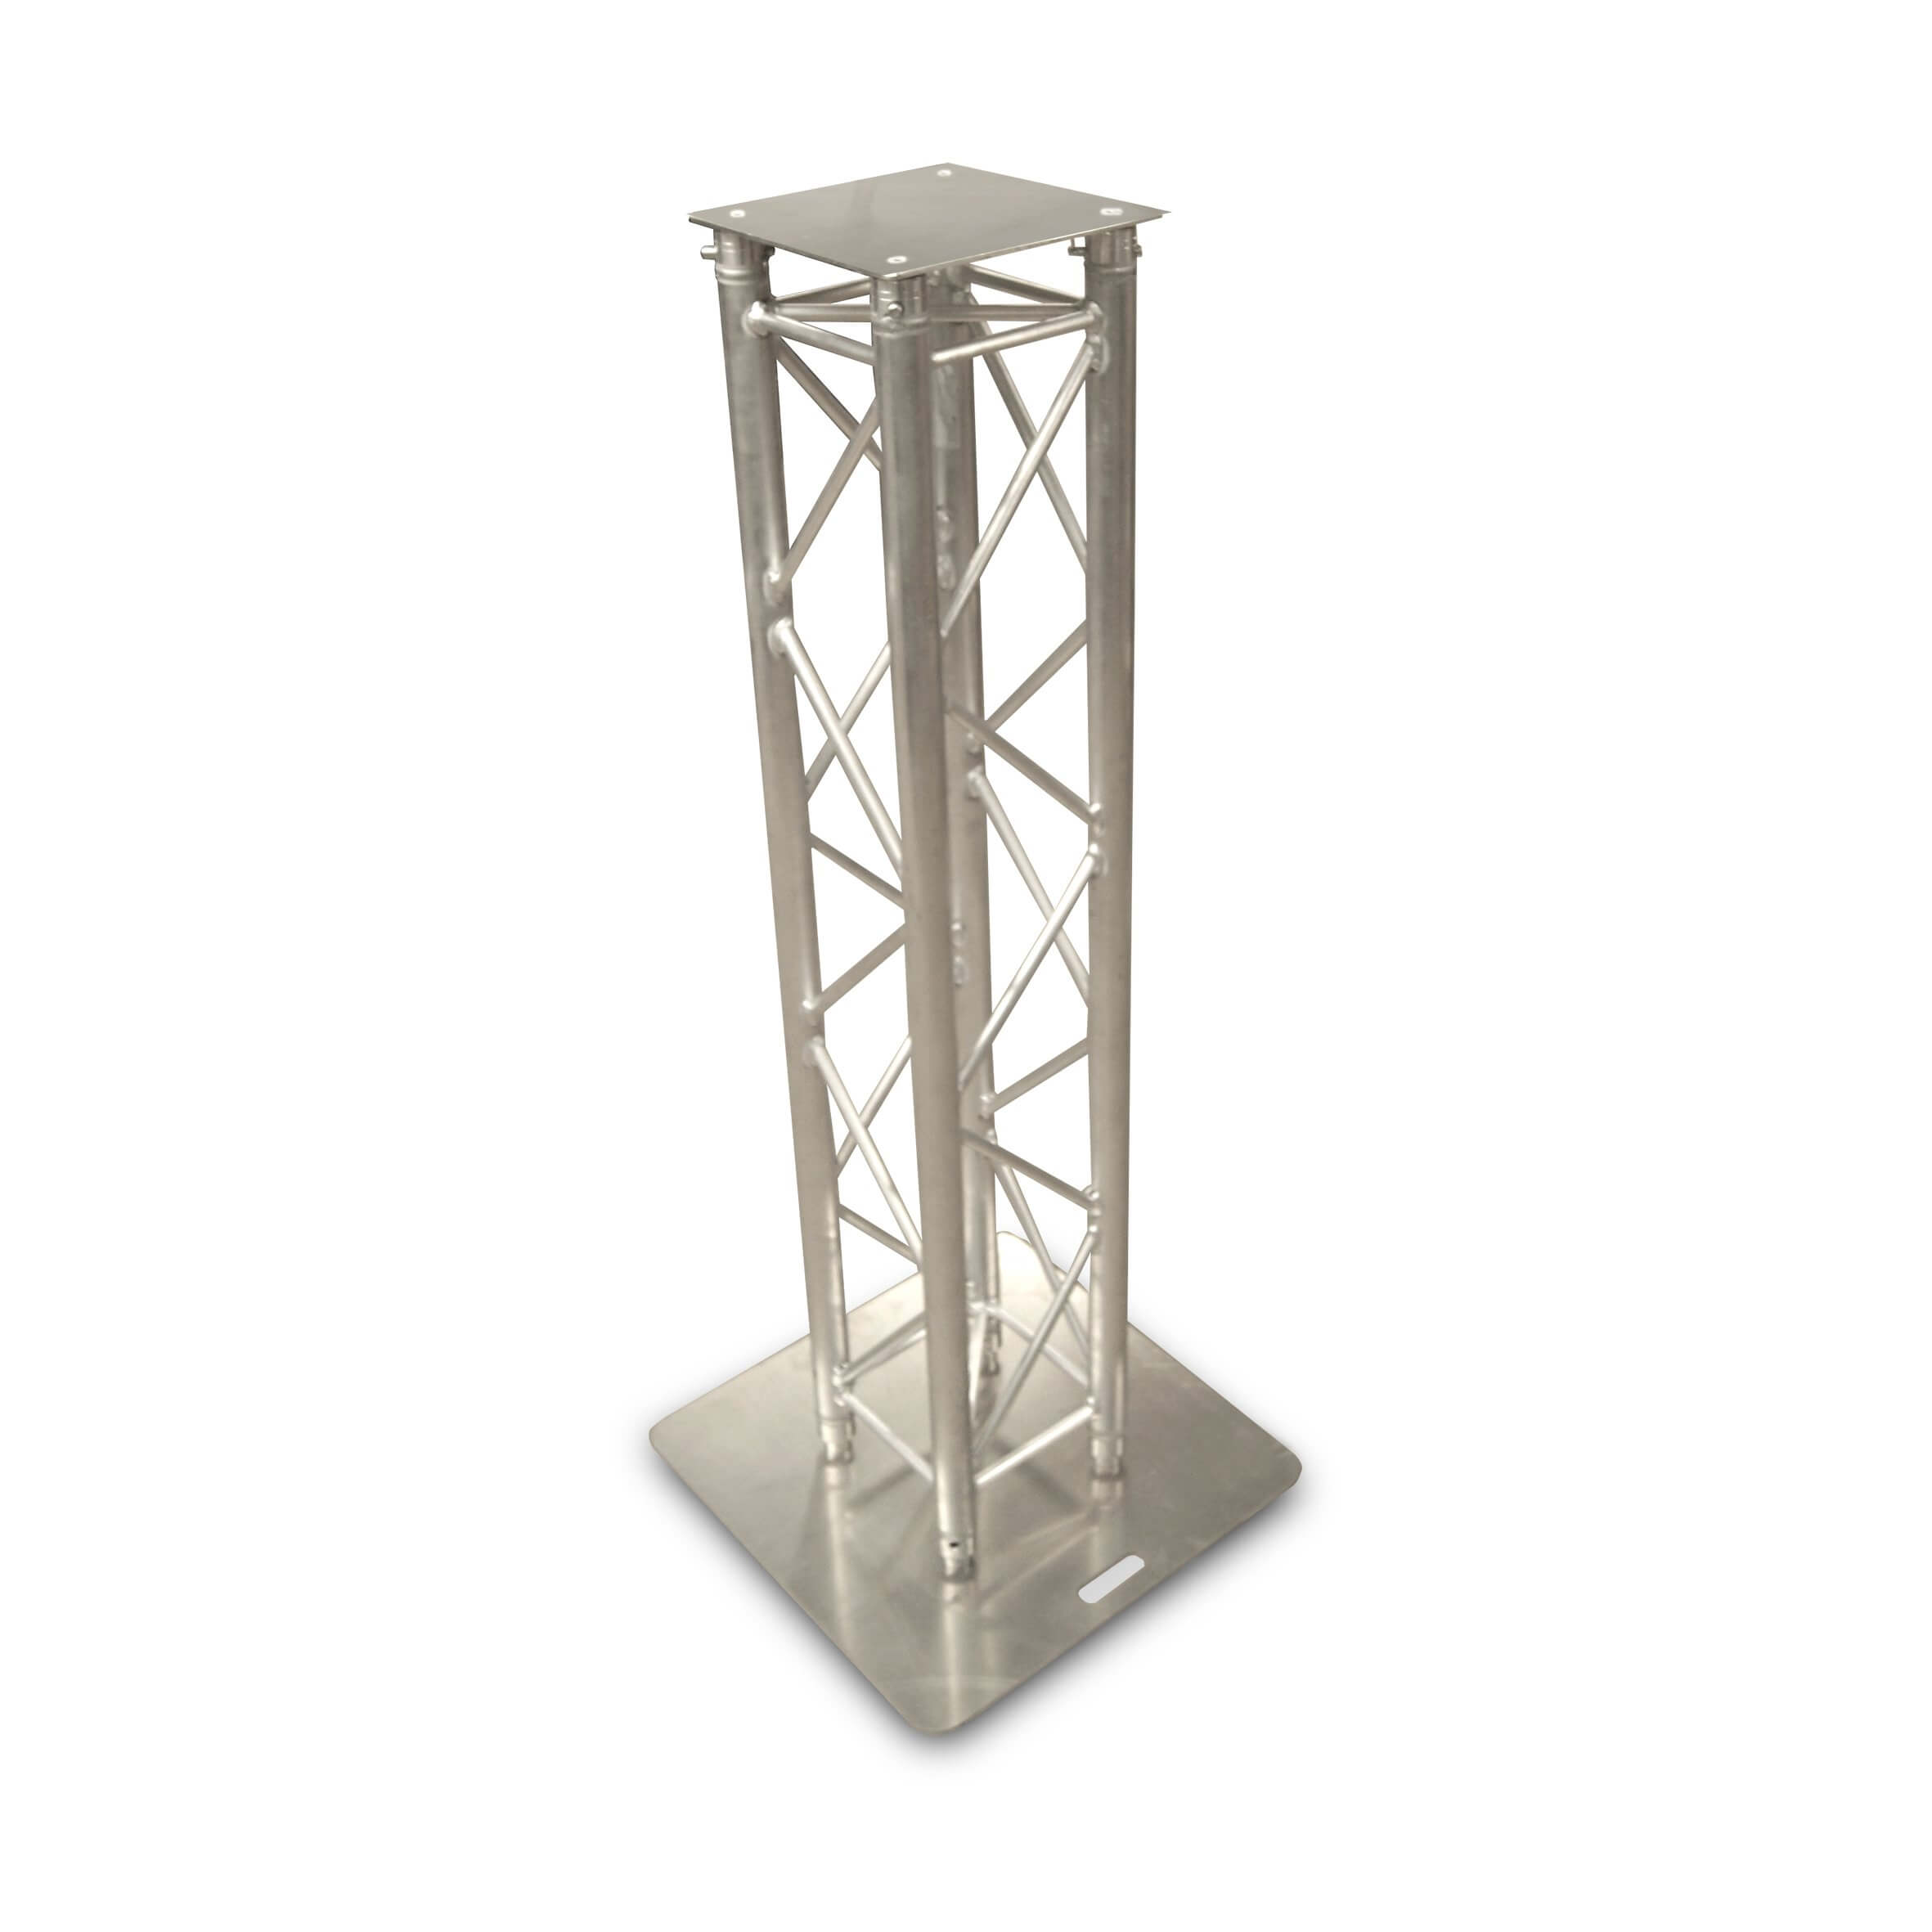 Lightspace Truss Podium 1.5m Moving Head Light Plinth